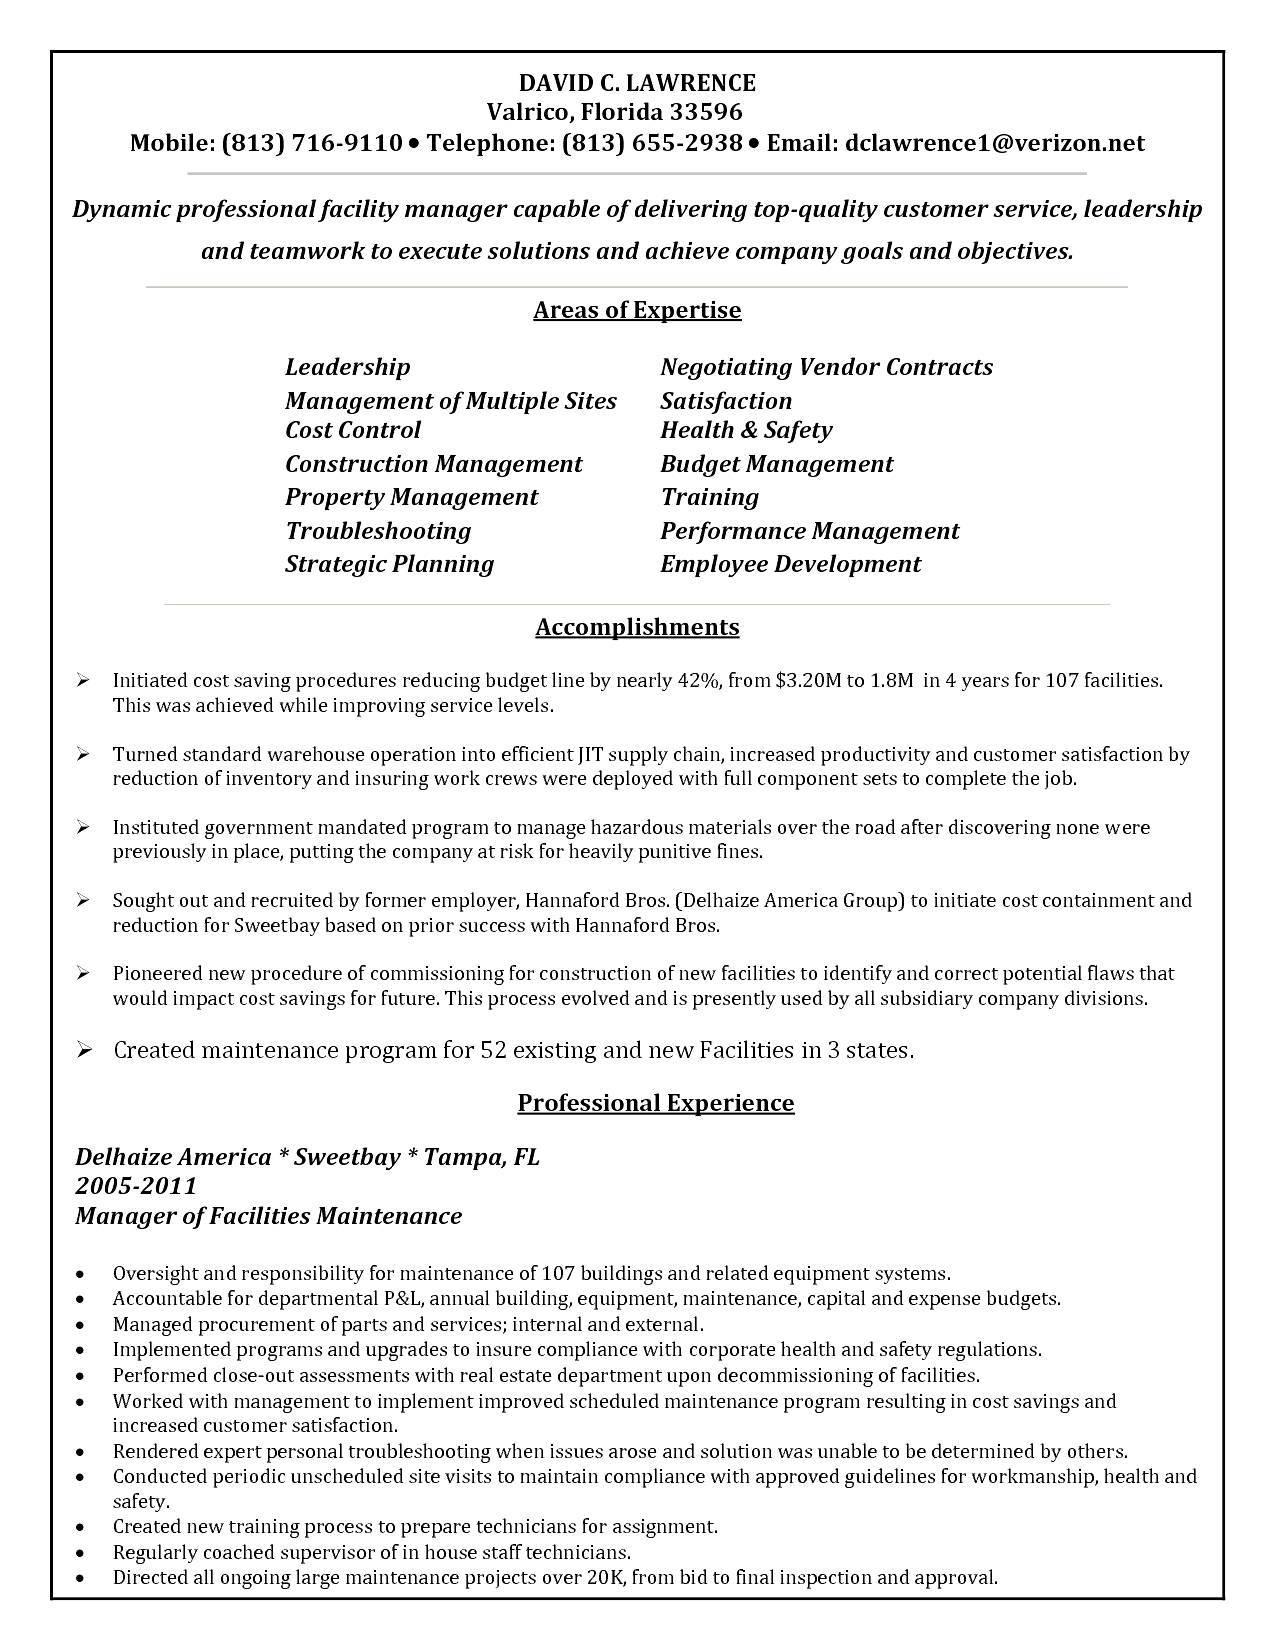 Operations Supervisor Resume Templates - Templates #112850 ...